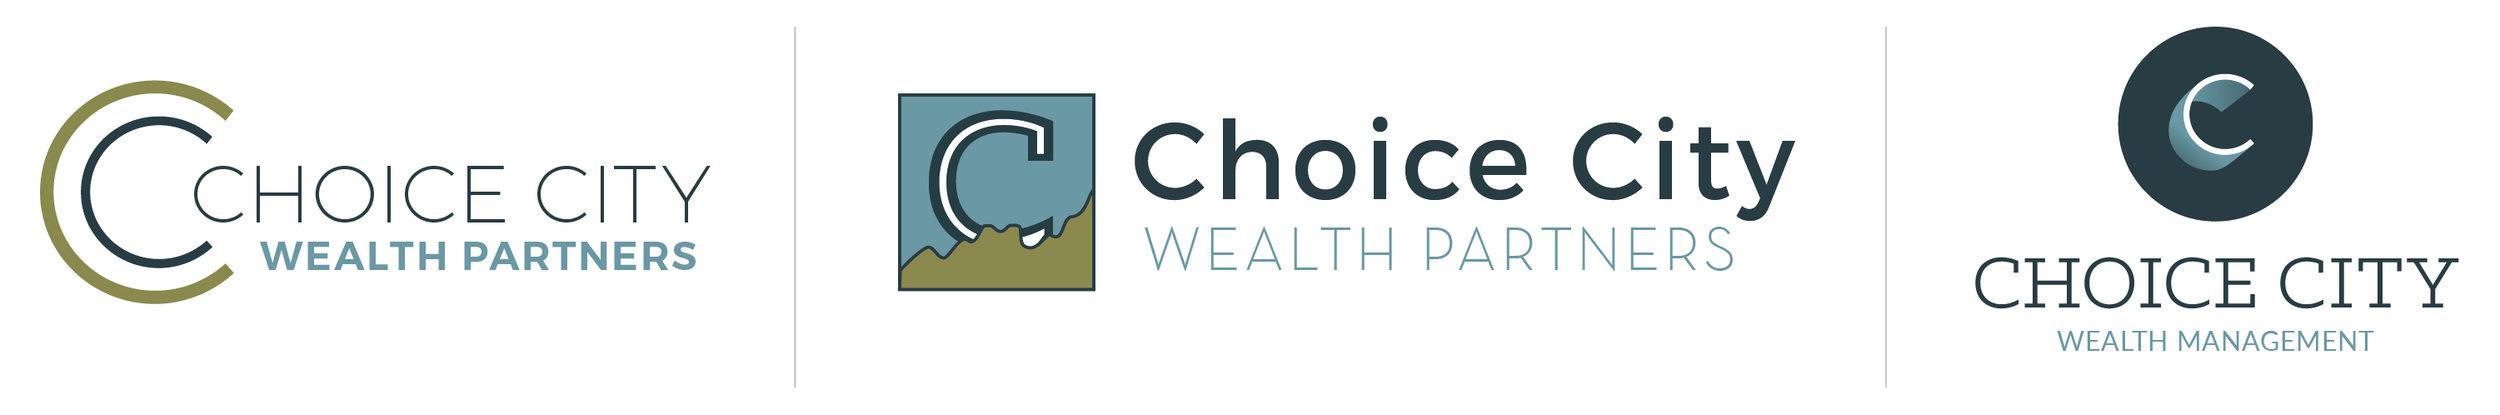 ChoiceCIty_FirstLook-04.jpg